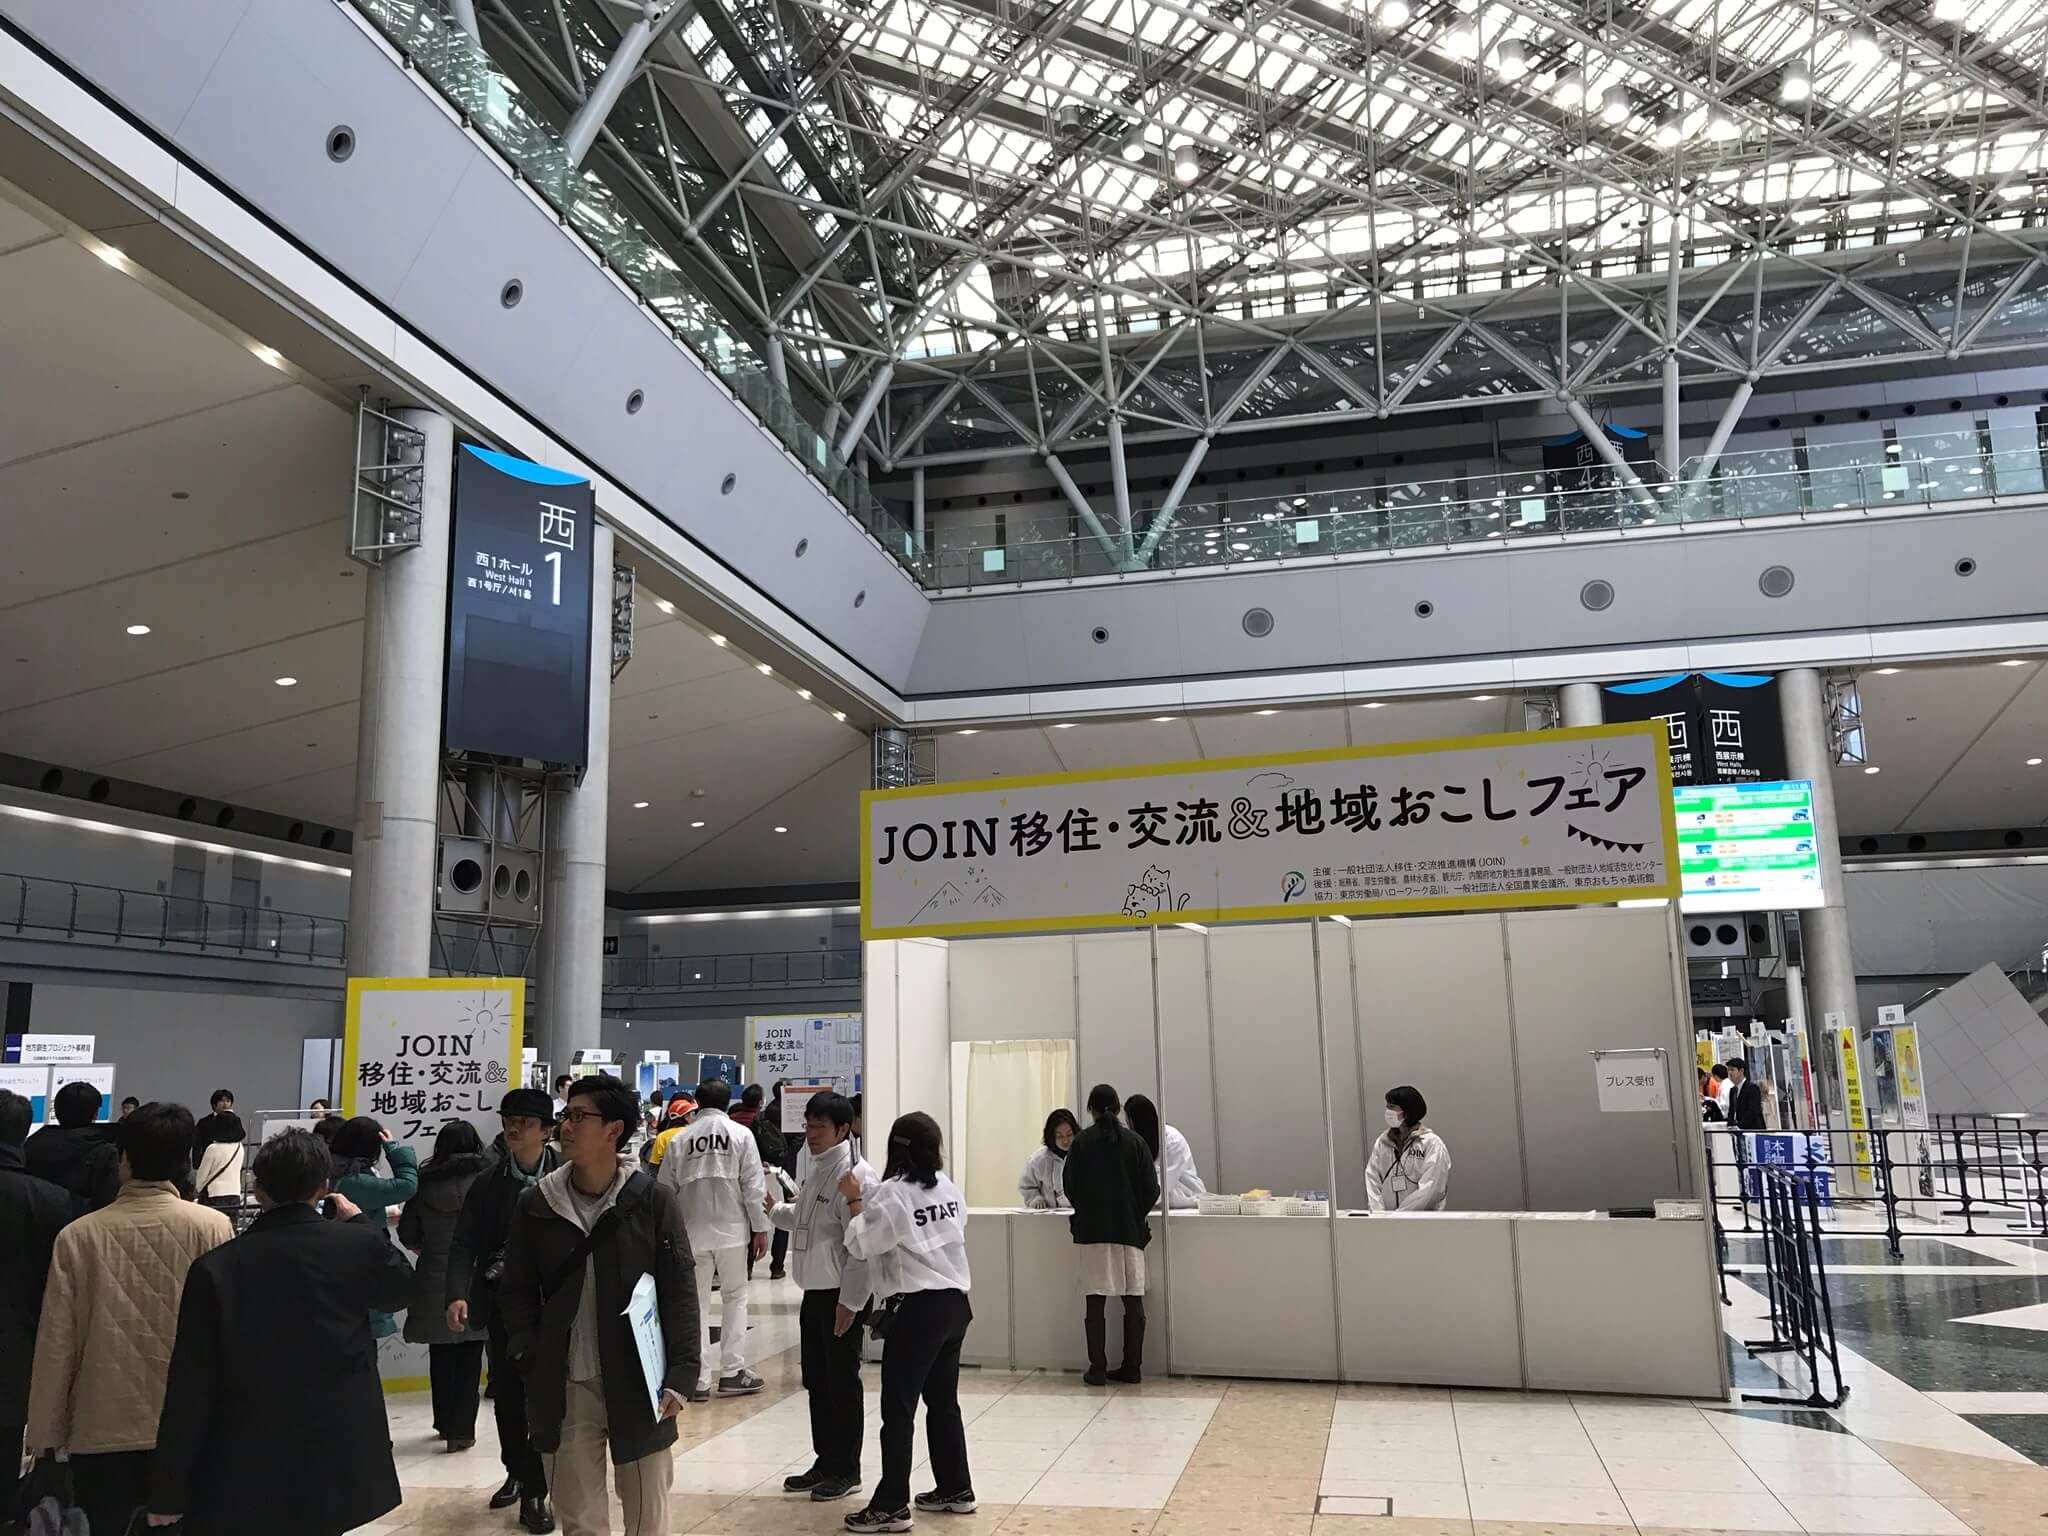 JOIN移住・交流&地域おこしフェア@東京ビッグサイトにいってきました